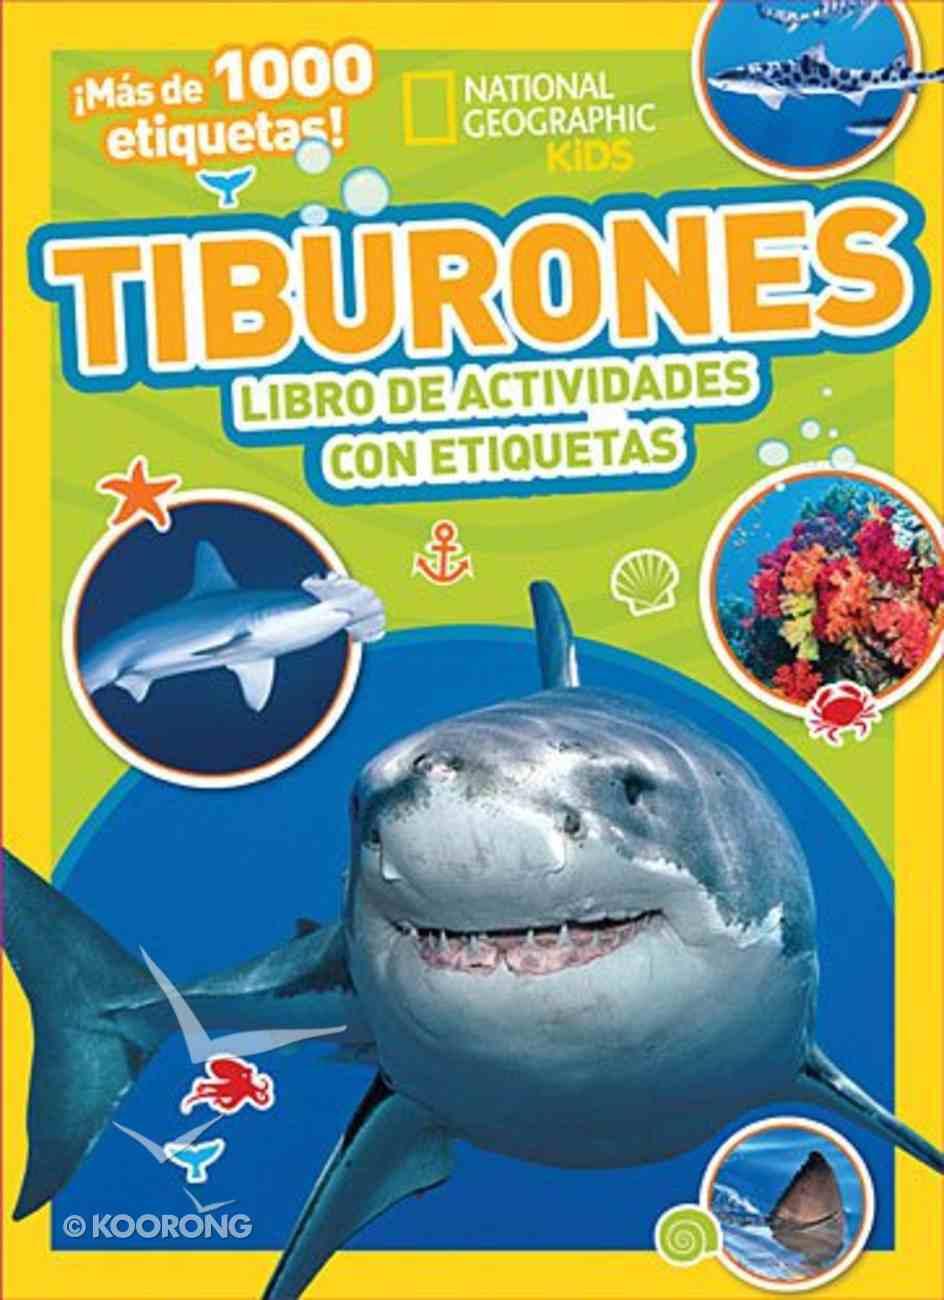 Tiburones (Sharks Activity Stickers) Novelty Book